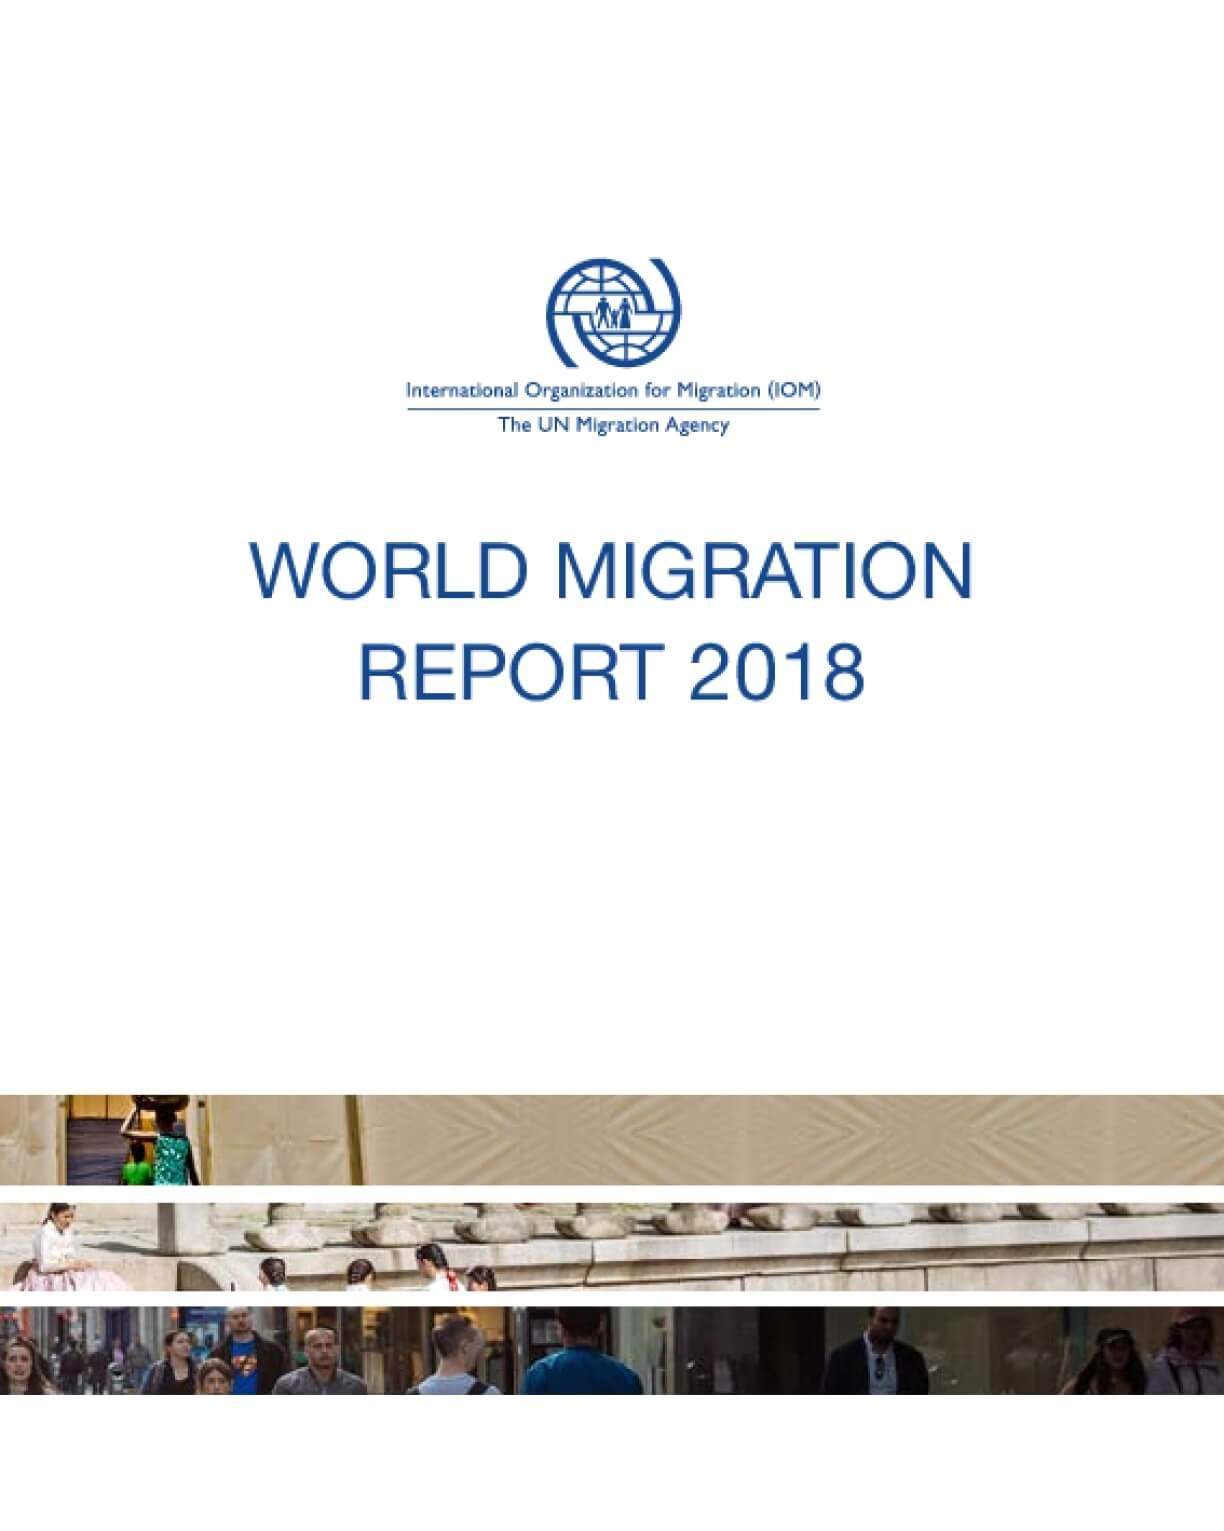 World Migration Report 2018